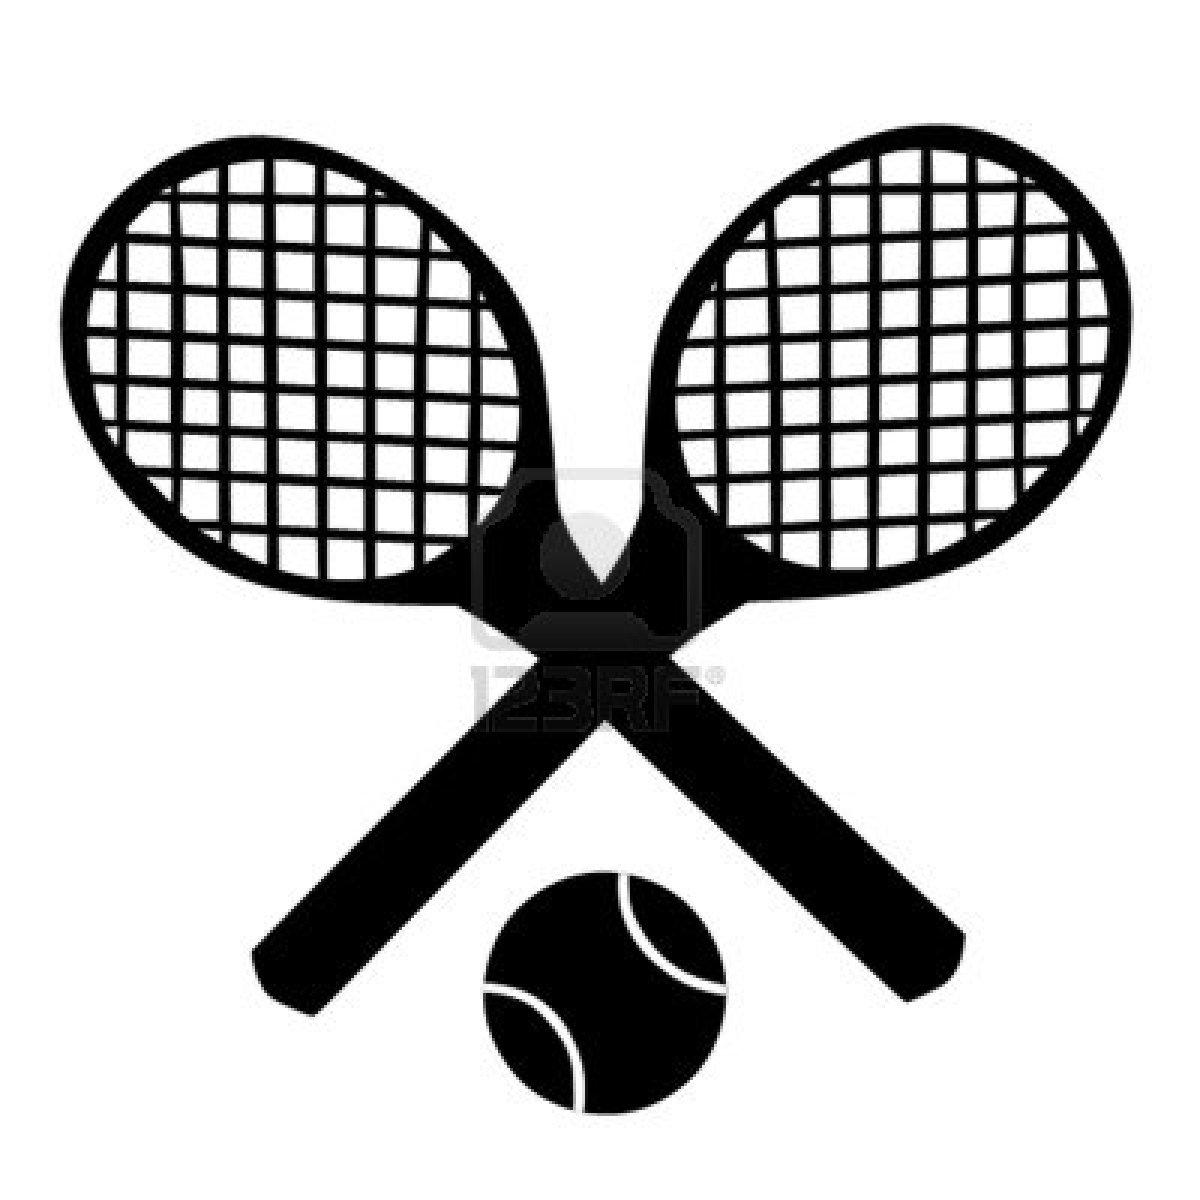 clipart panda tennis - photo #20